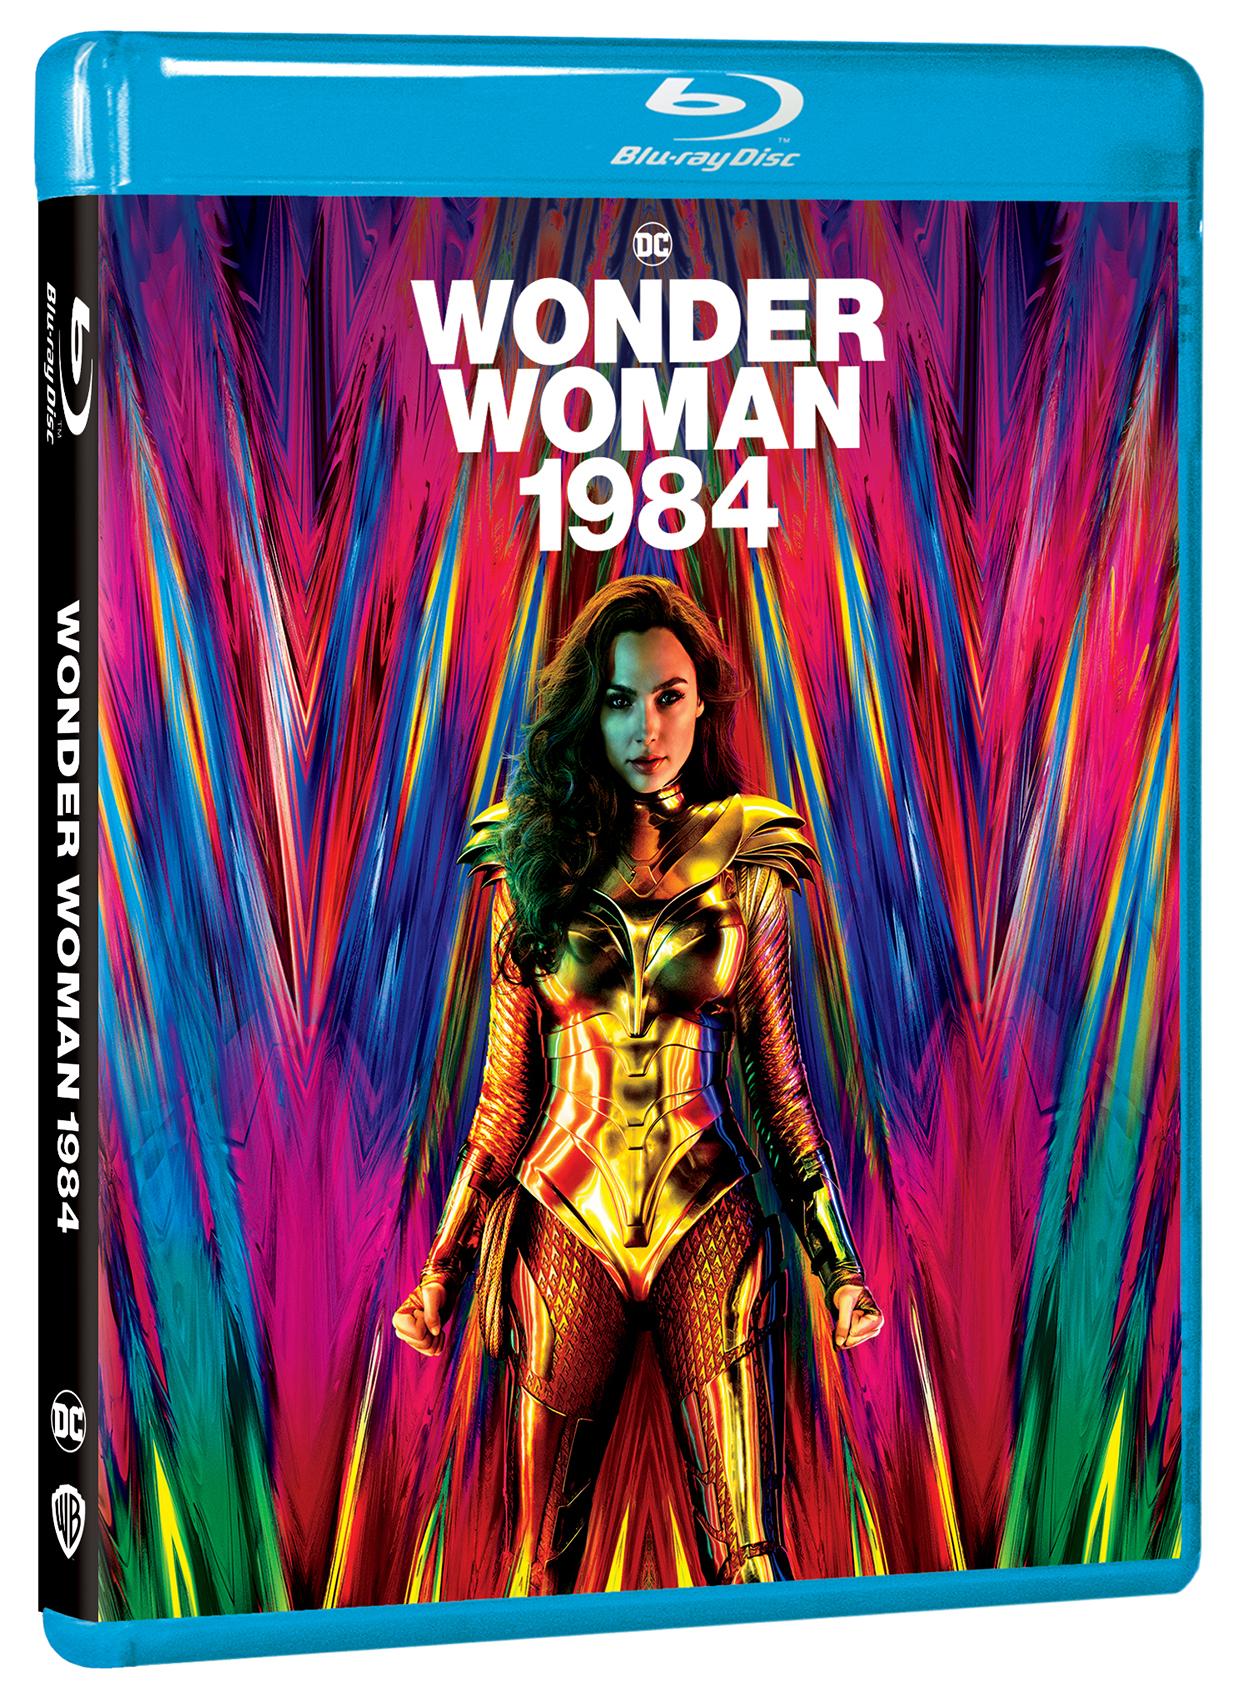 Wonder Woman 1984 (Blu-Ray Disc)